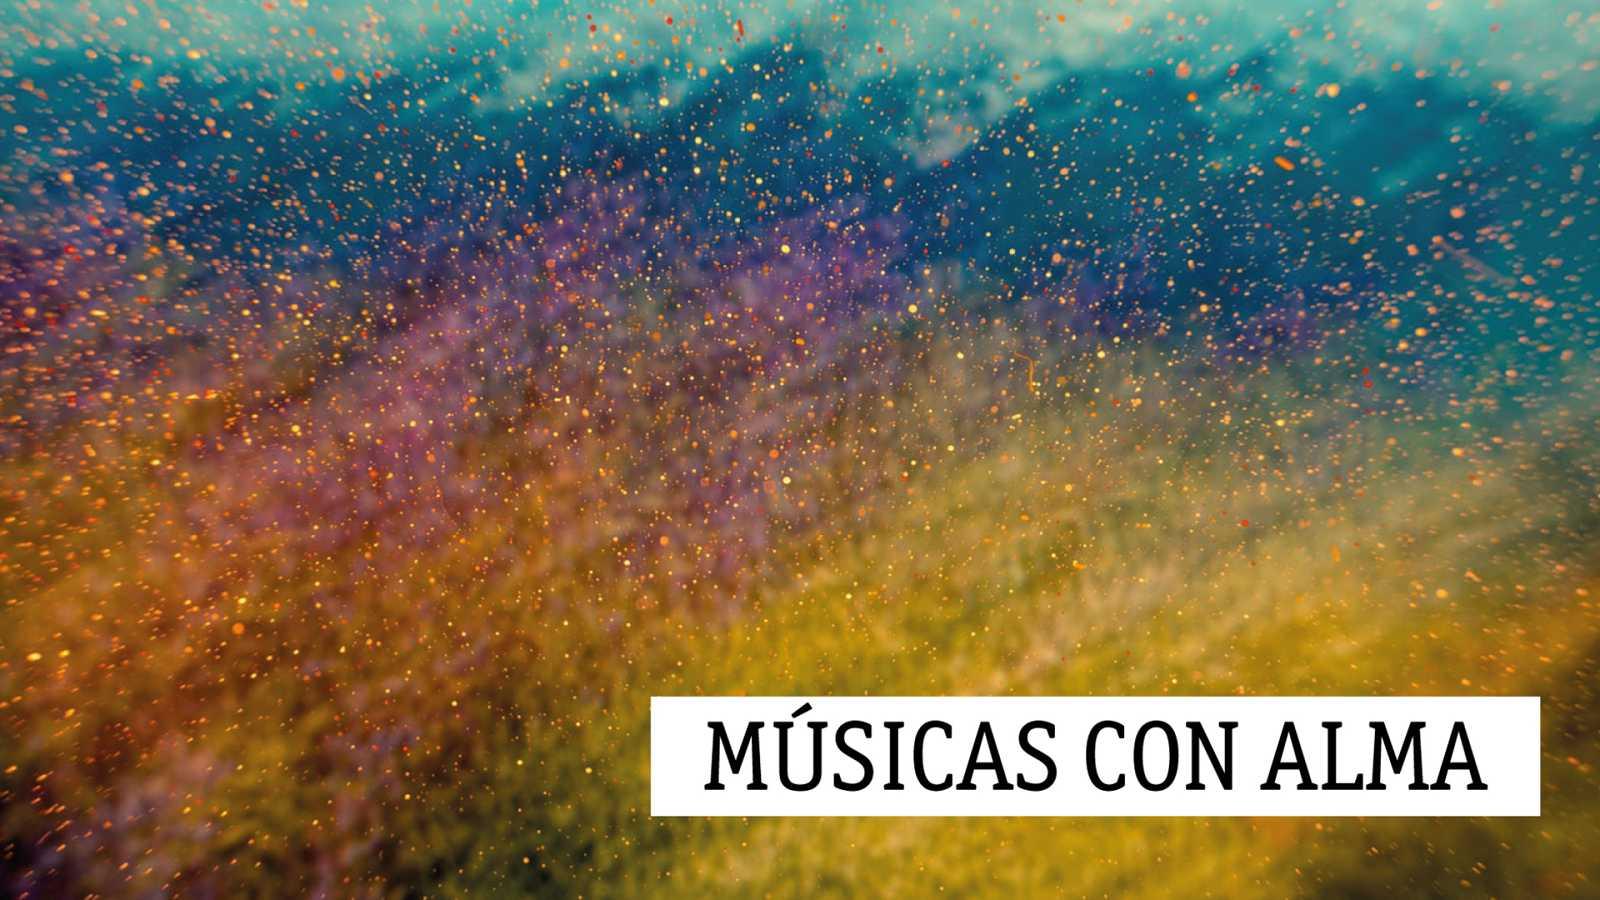 Músicas con alma - Escaleras - 15/02/21 - escuchar ahora